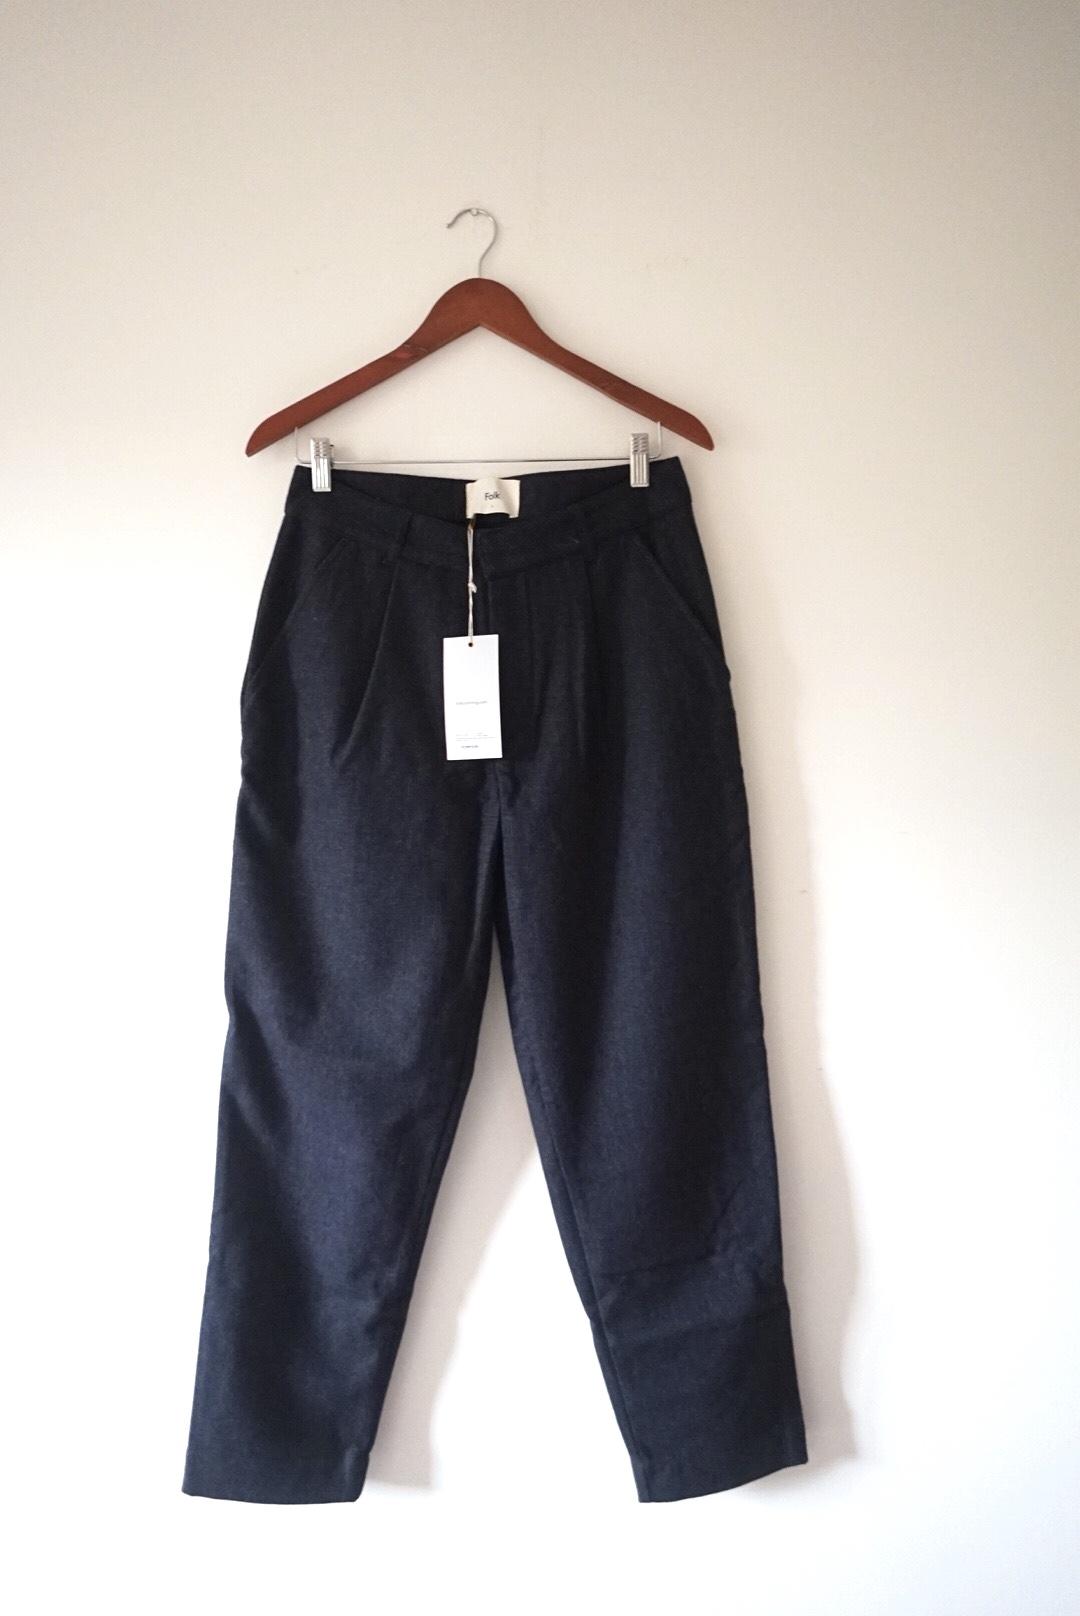 Image of Folk Folk Men Wool Tailored Navy Pinstripe Trousers Size S